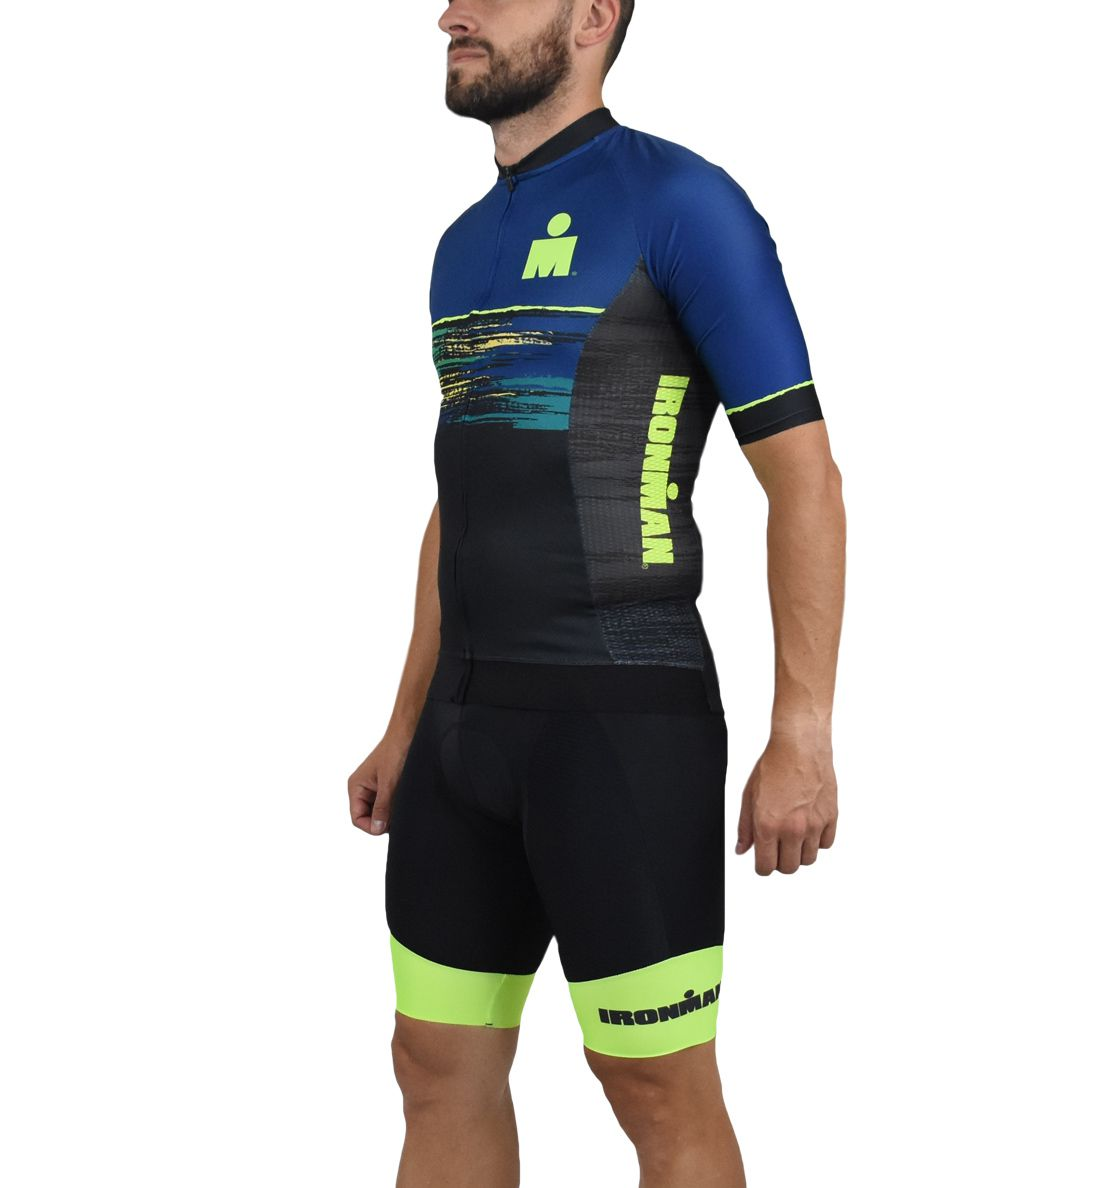 Camisa Ciclismo Azul Marinho - Masc - Ironman - Woom